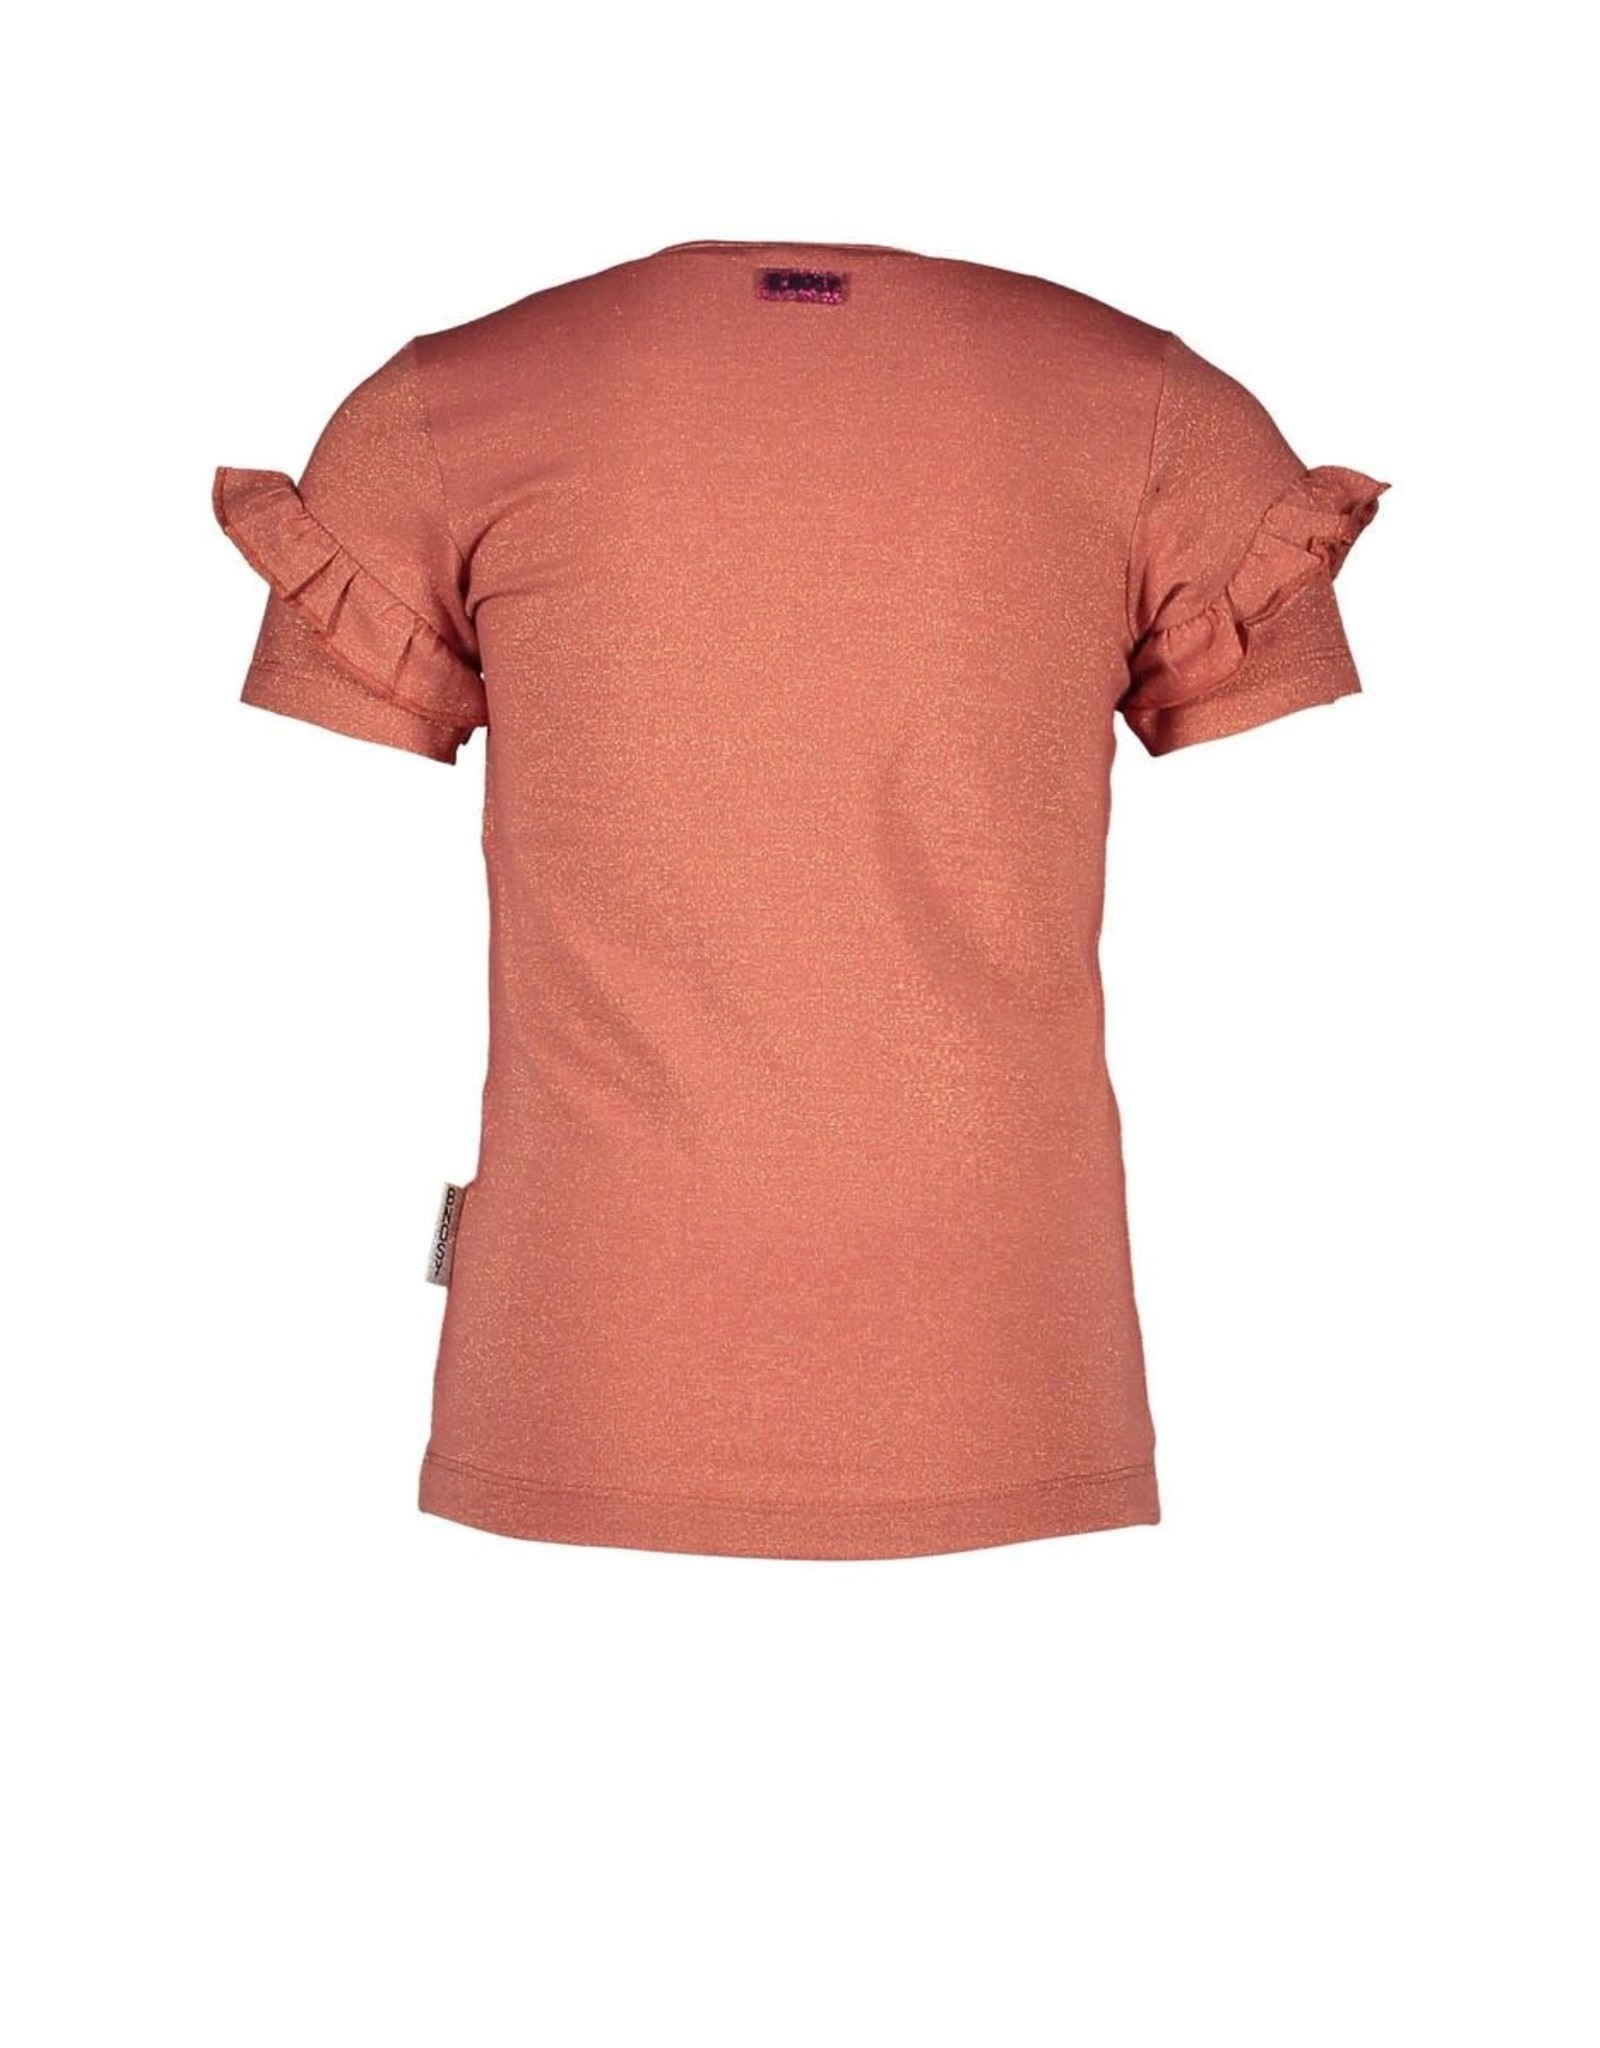 B.Nosy B.Nosy meisjes t-shirt Iconic Pale Brown